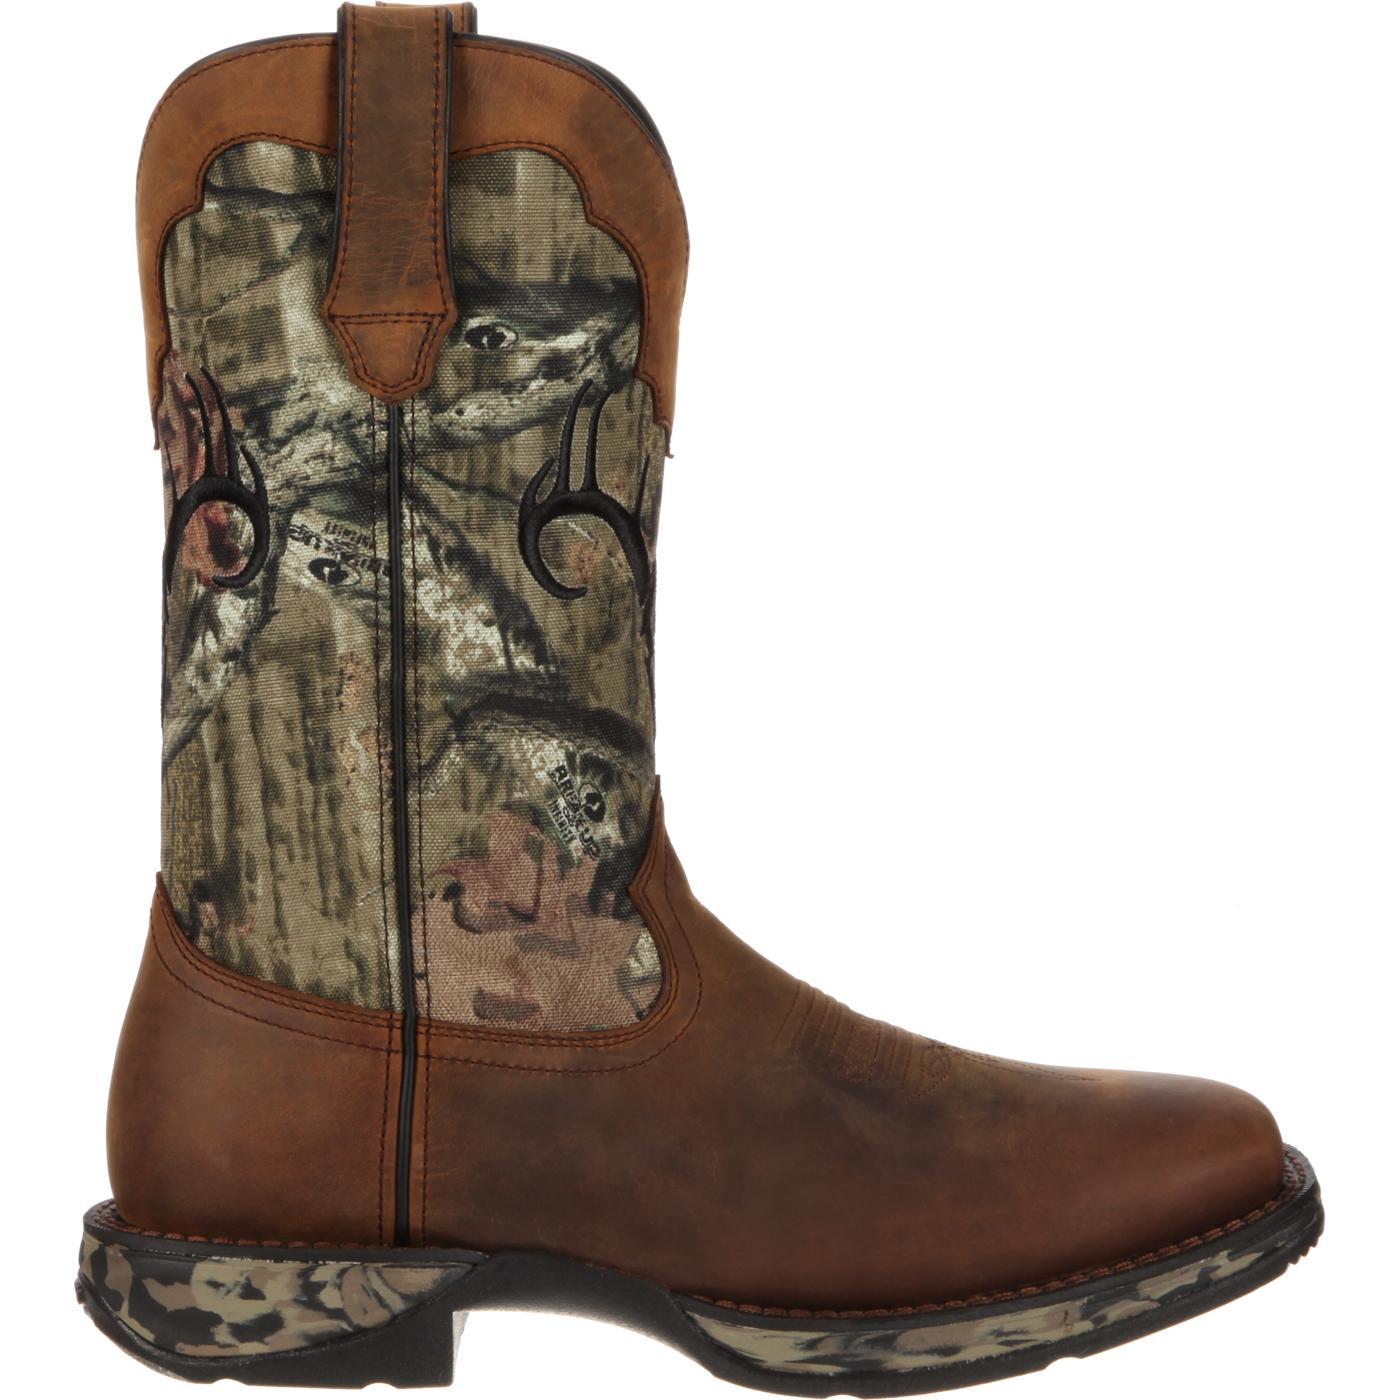 Rebel by Durango Waterproof Camo Deer Skull Western Boot, DDB0058